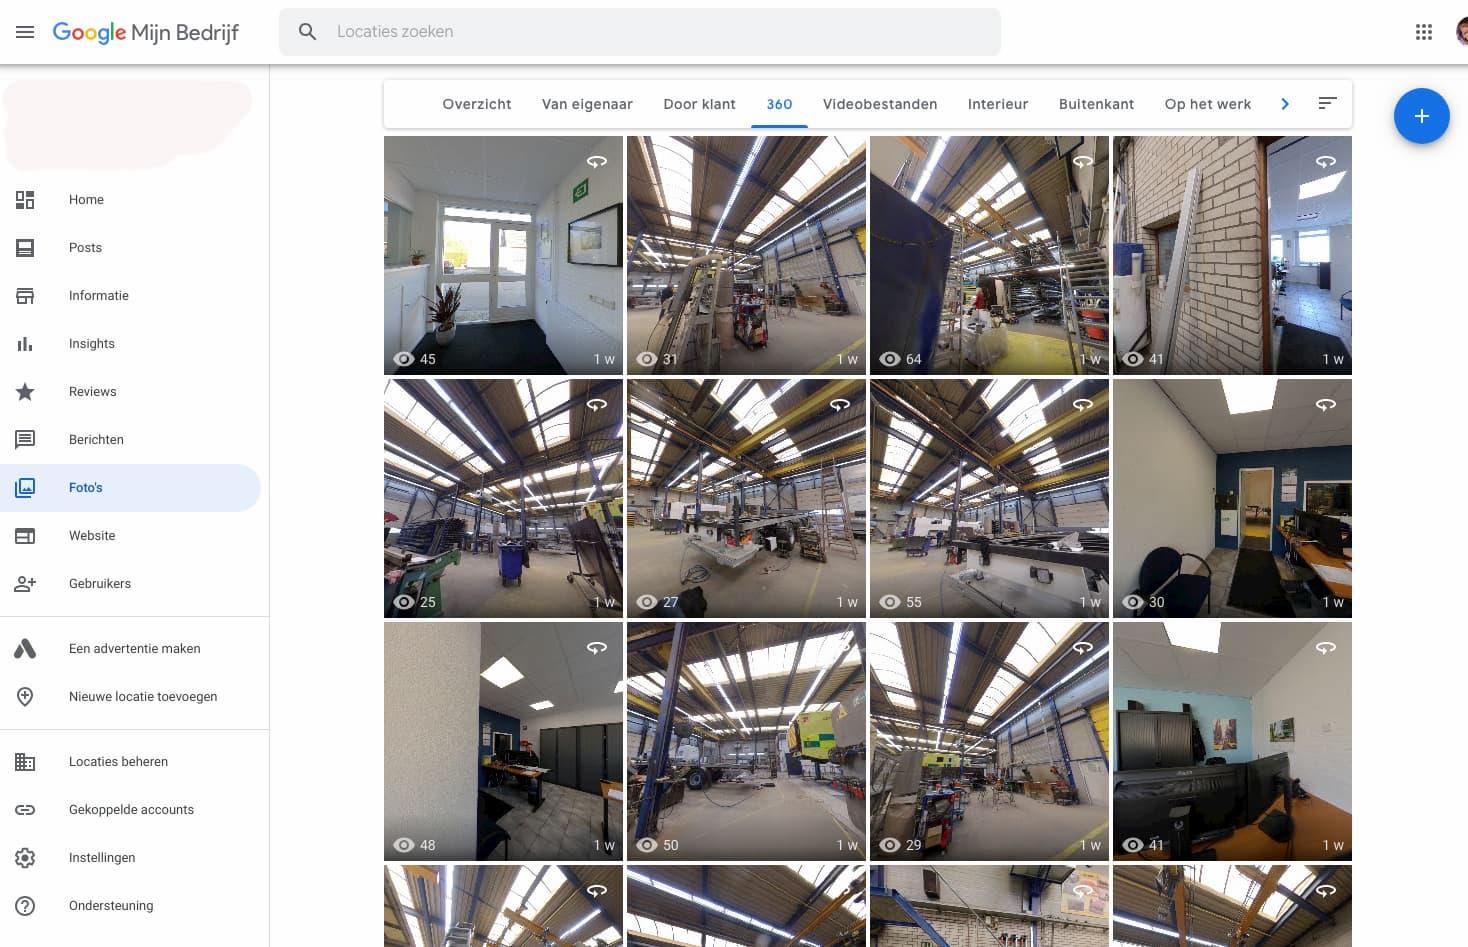 Screenshot 360 graden foto's virtuele tour in GMB account op de computer